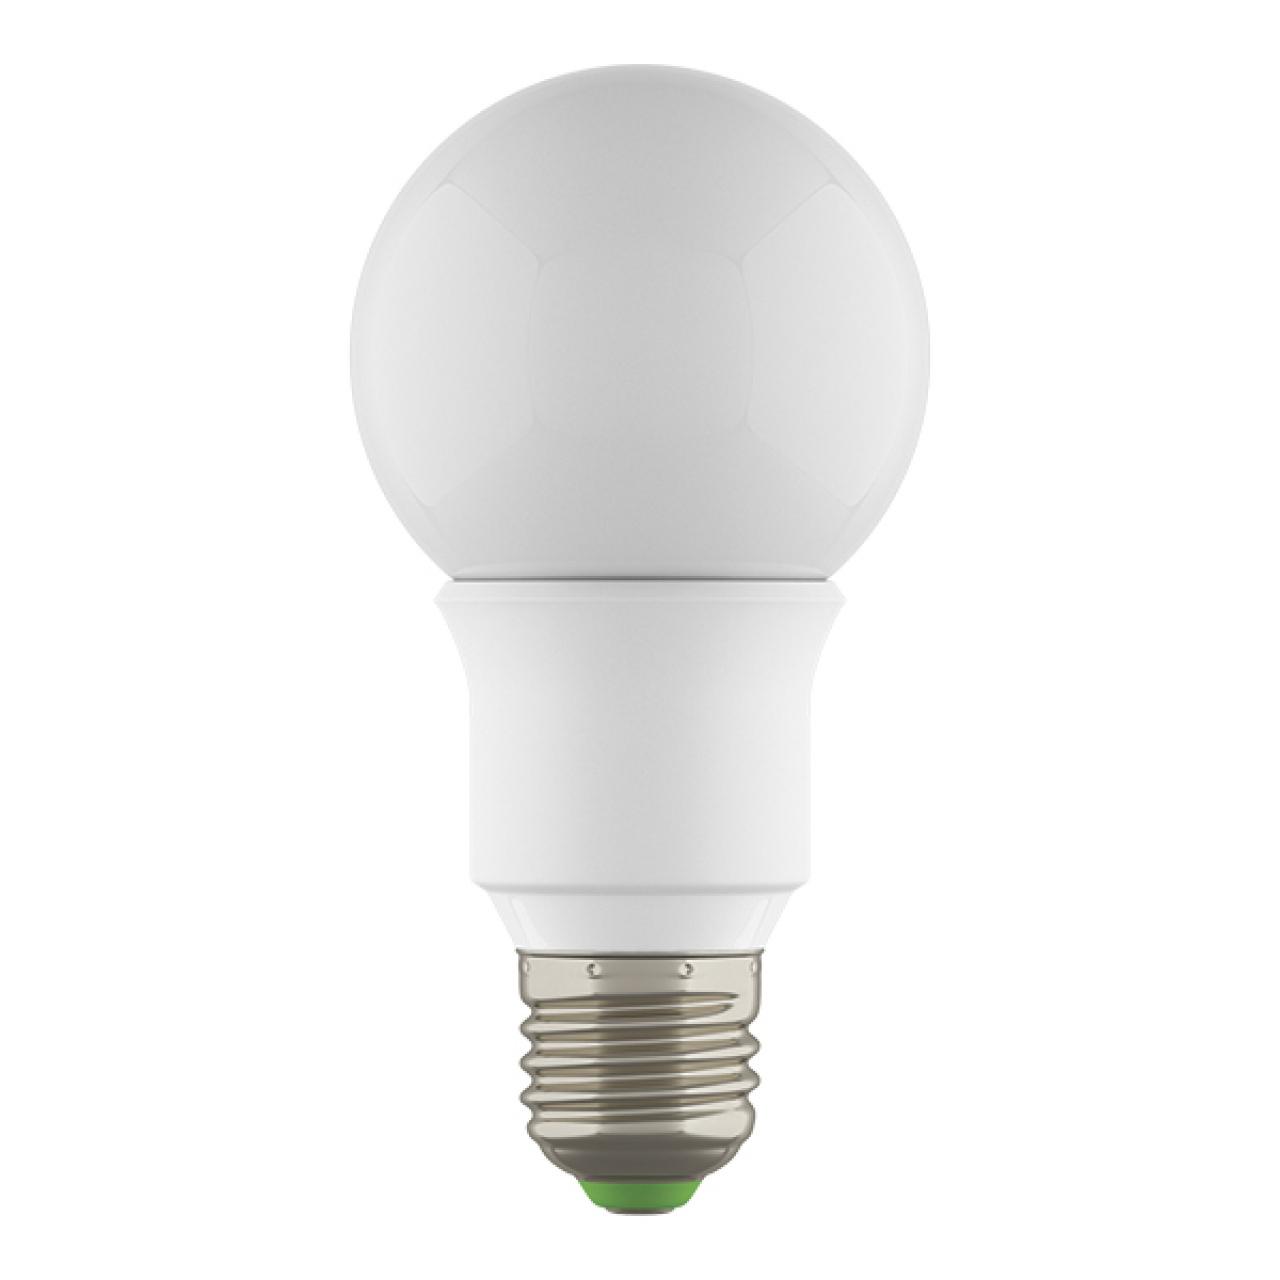 Лампа LED 220V A60 E27 6W=60W 500LM 360G WH 3000K 20000H DIMM Lightstar 931002